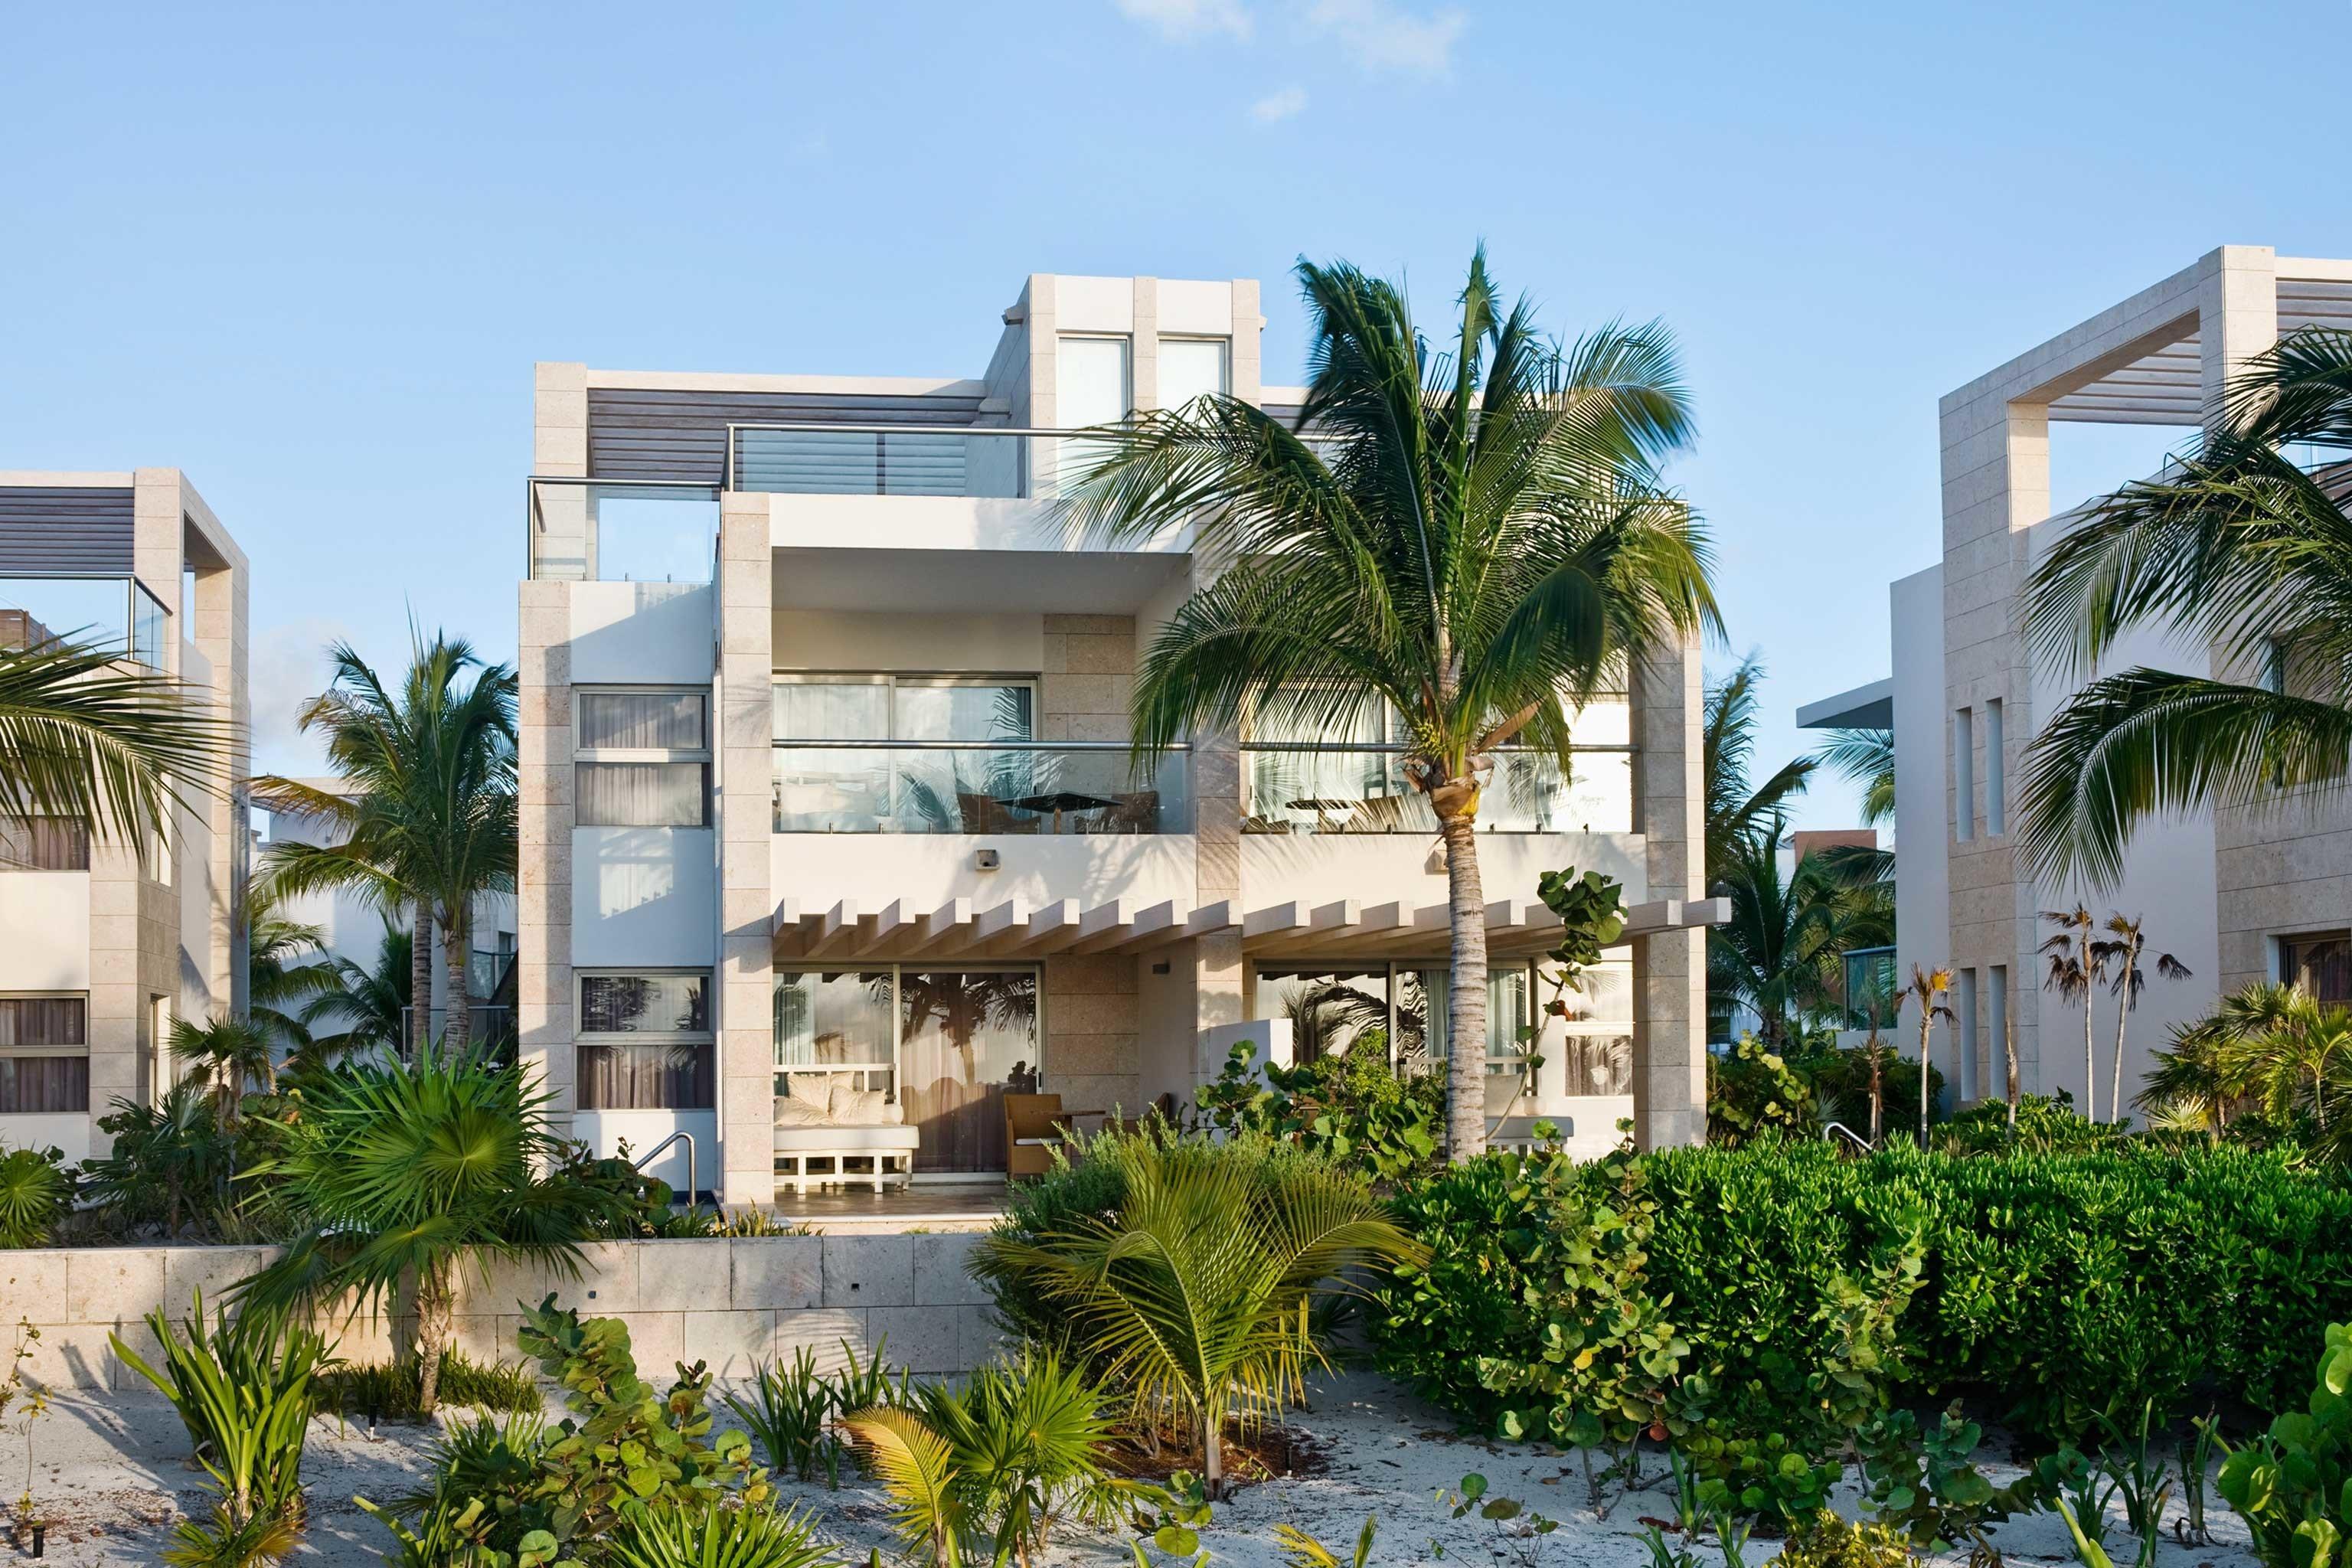 Exterior Luxury Modern Tropical building condominium property plant house Resort residential area home neighbourhood flower Garden Villa mansion bushes